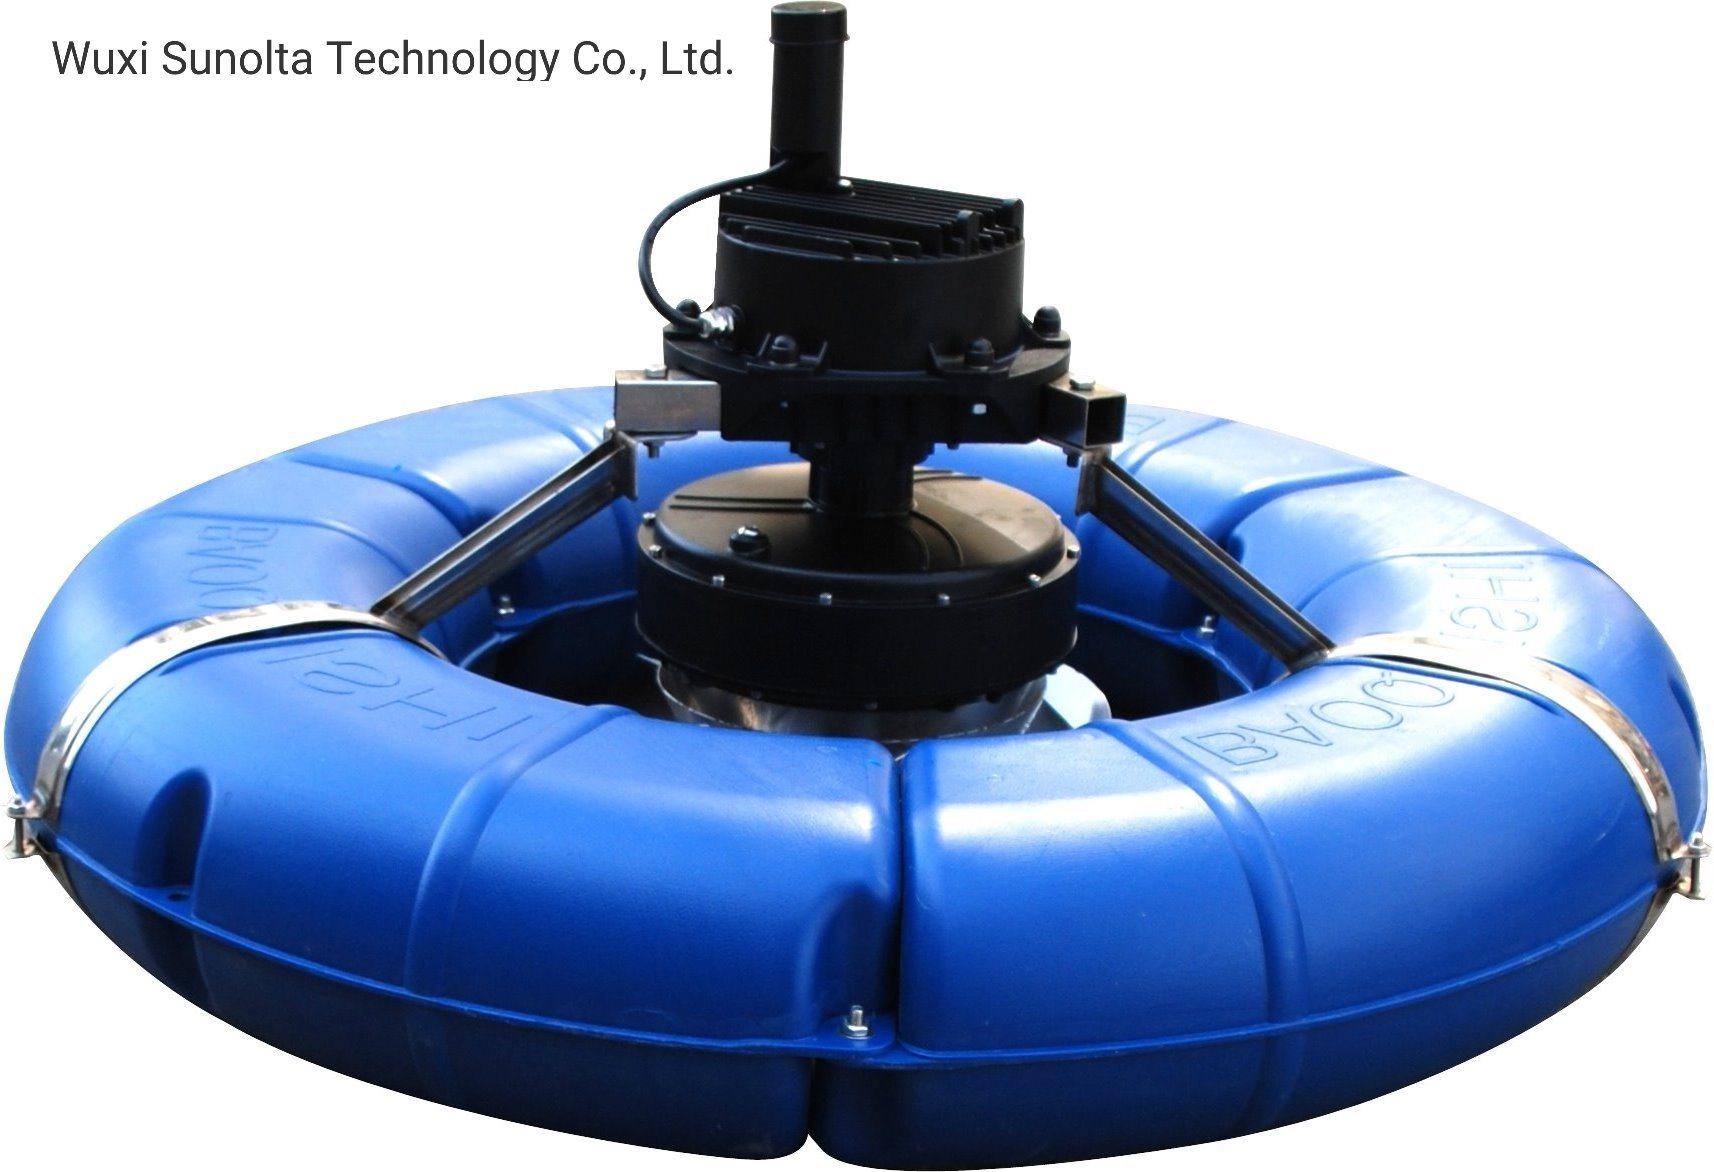 Wuxi Sunolta Technology Co., Ltd. Main Image